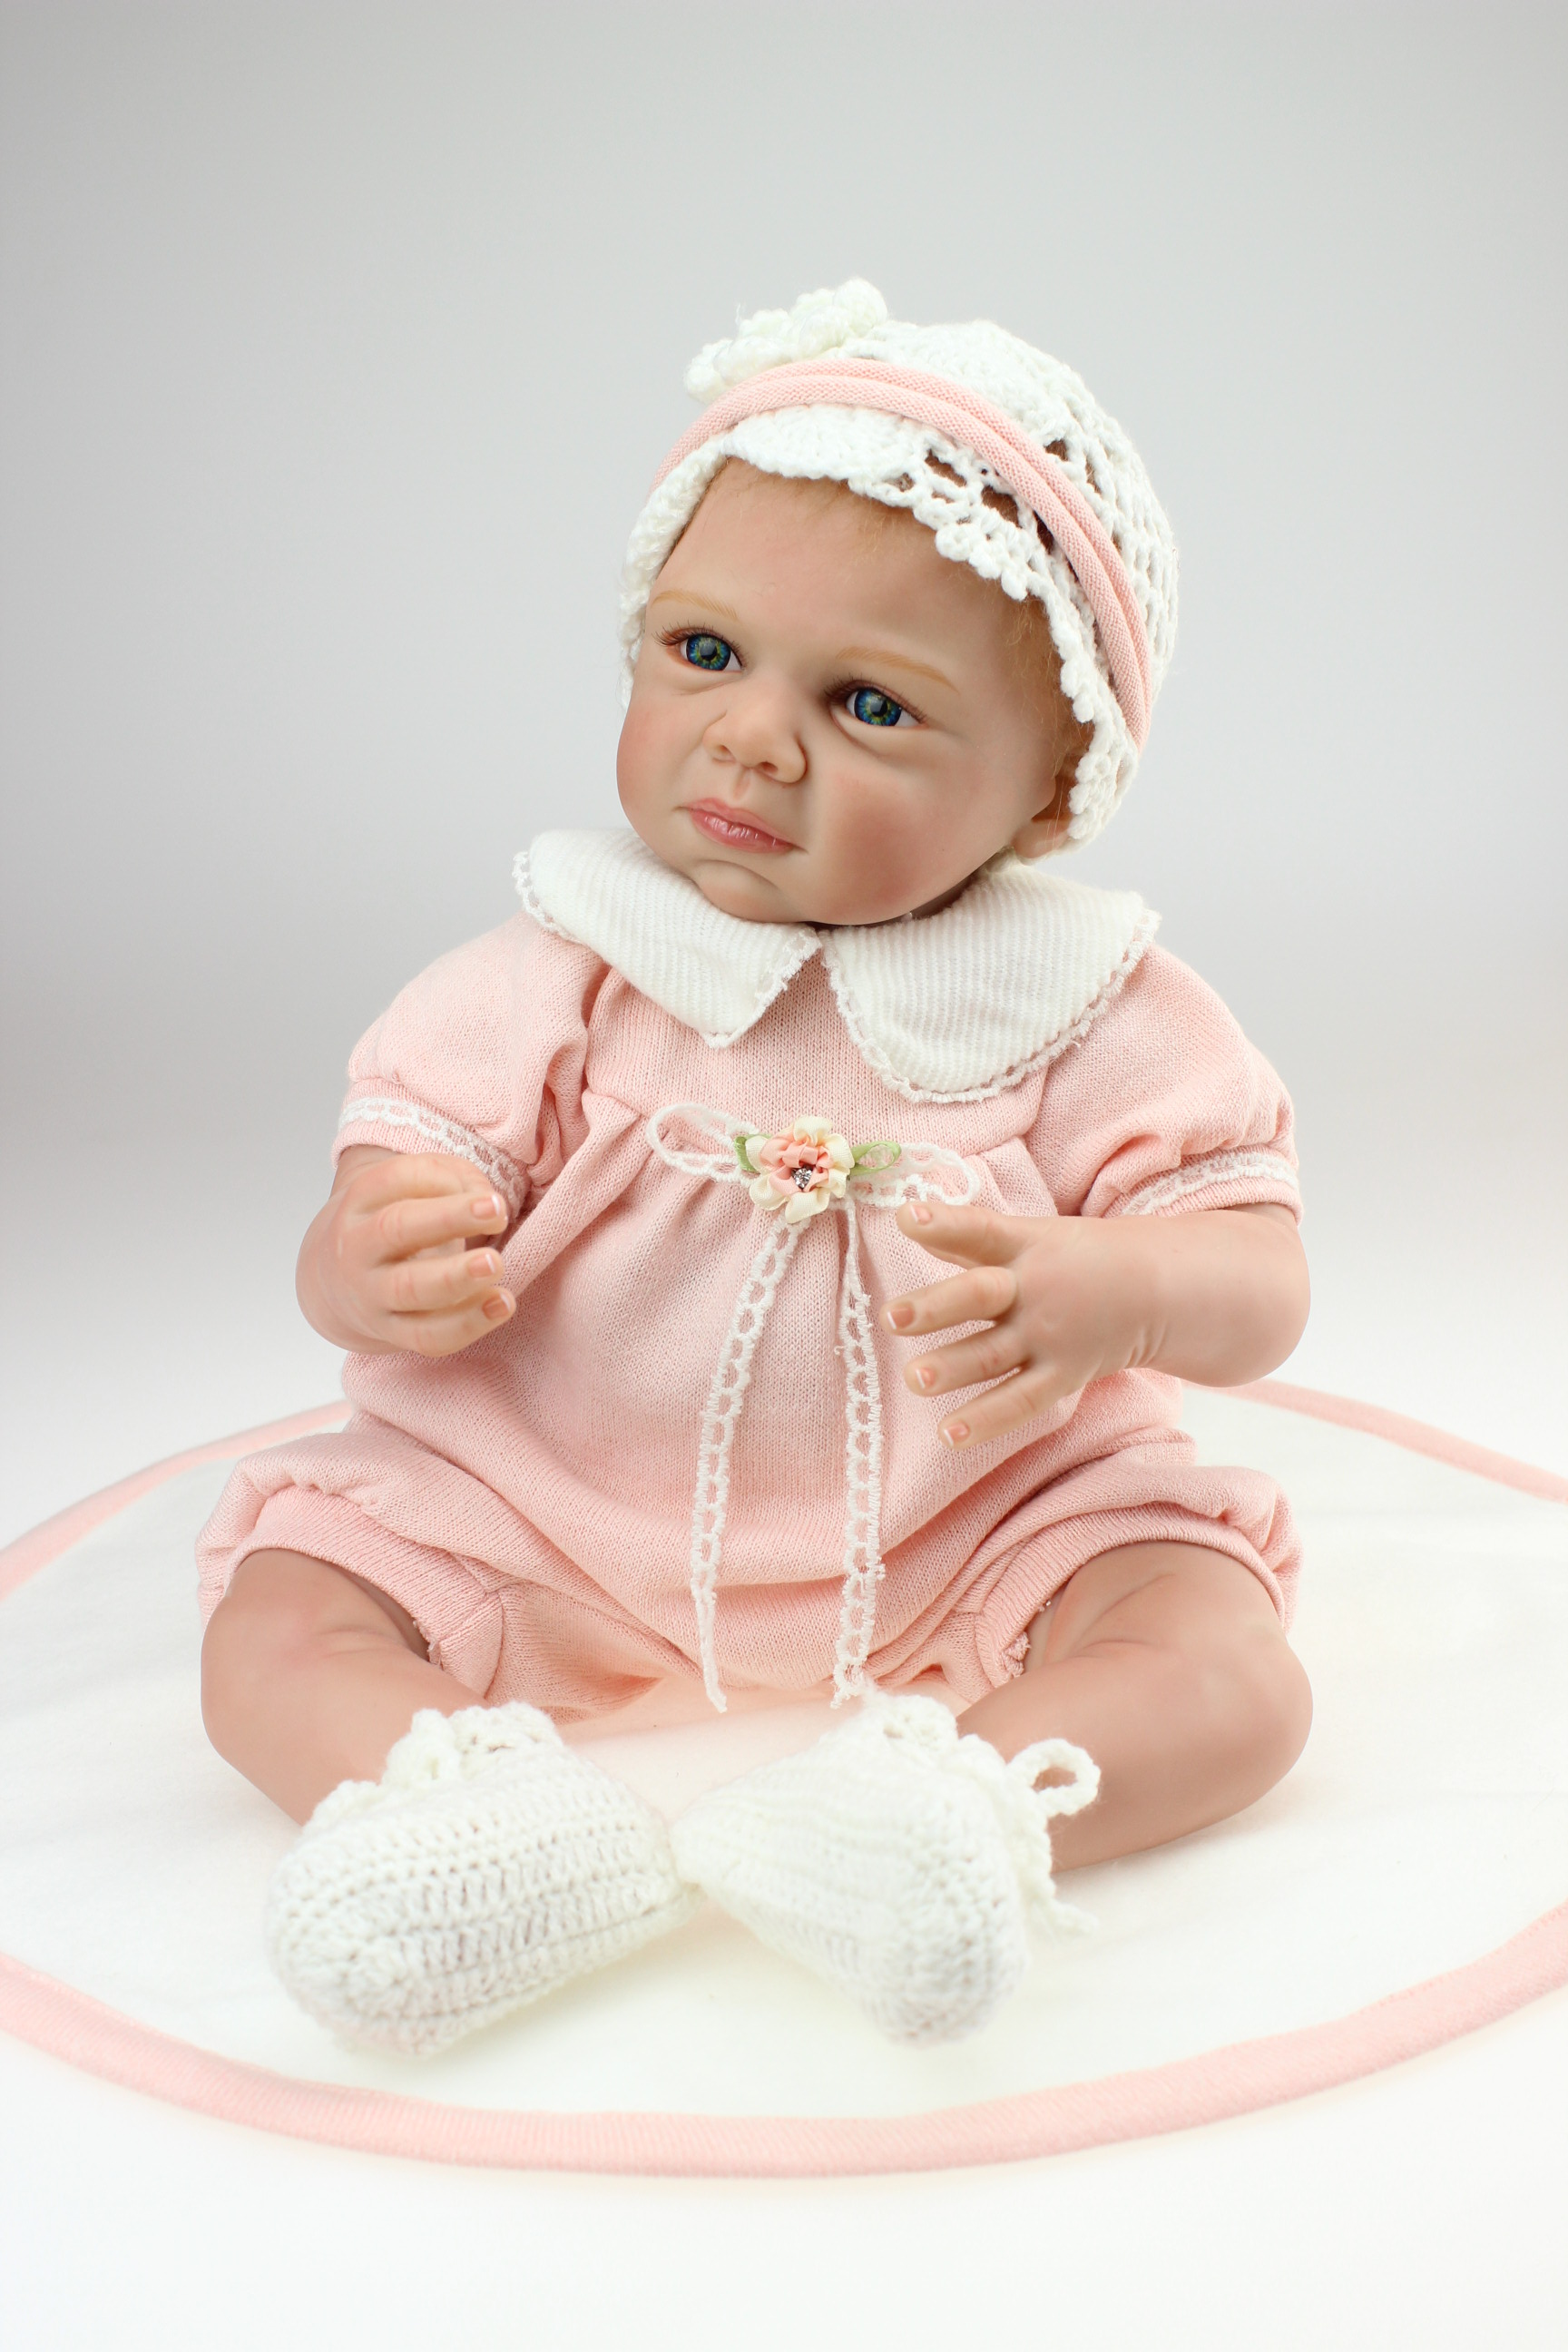 22 inch Reborn baby dolls 50cm silicone reborn baby dolls baby vinyl handmade lifelike baby doll body toys